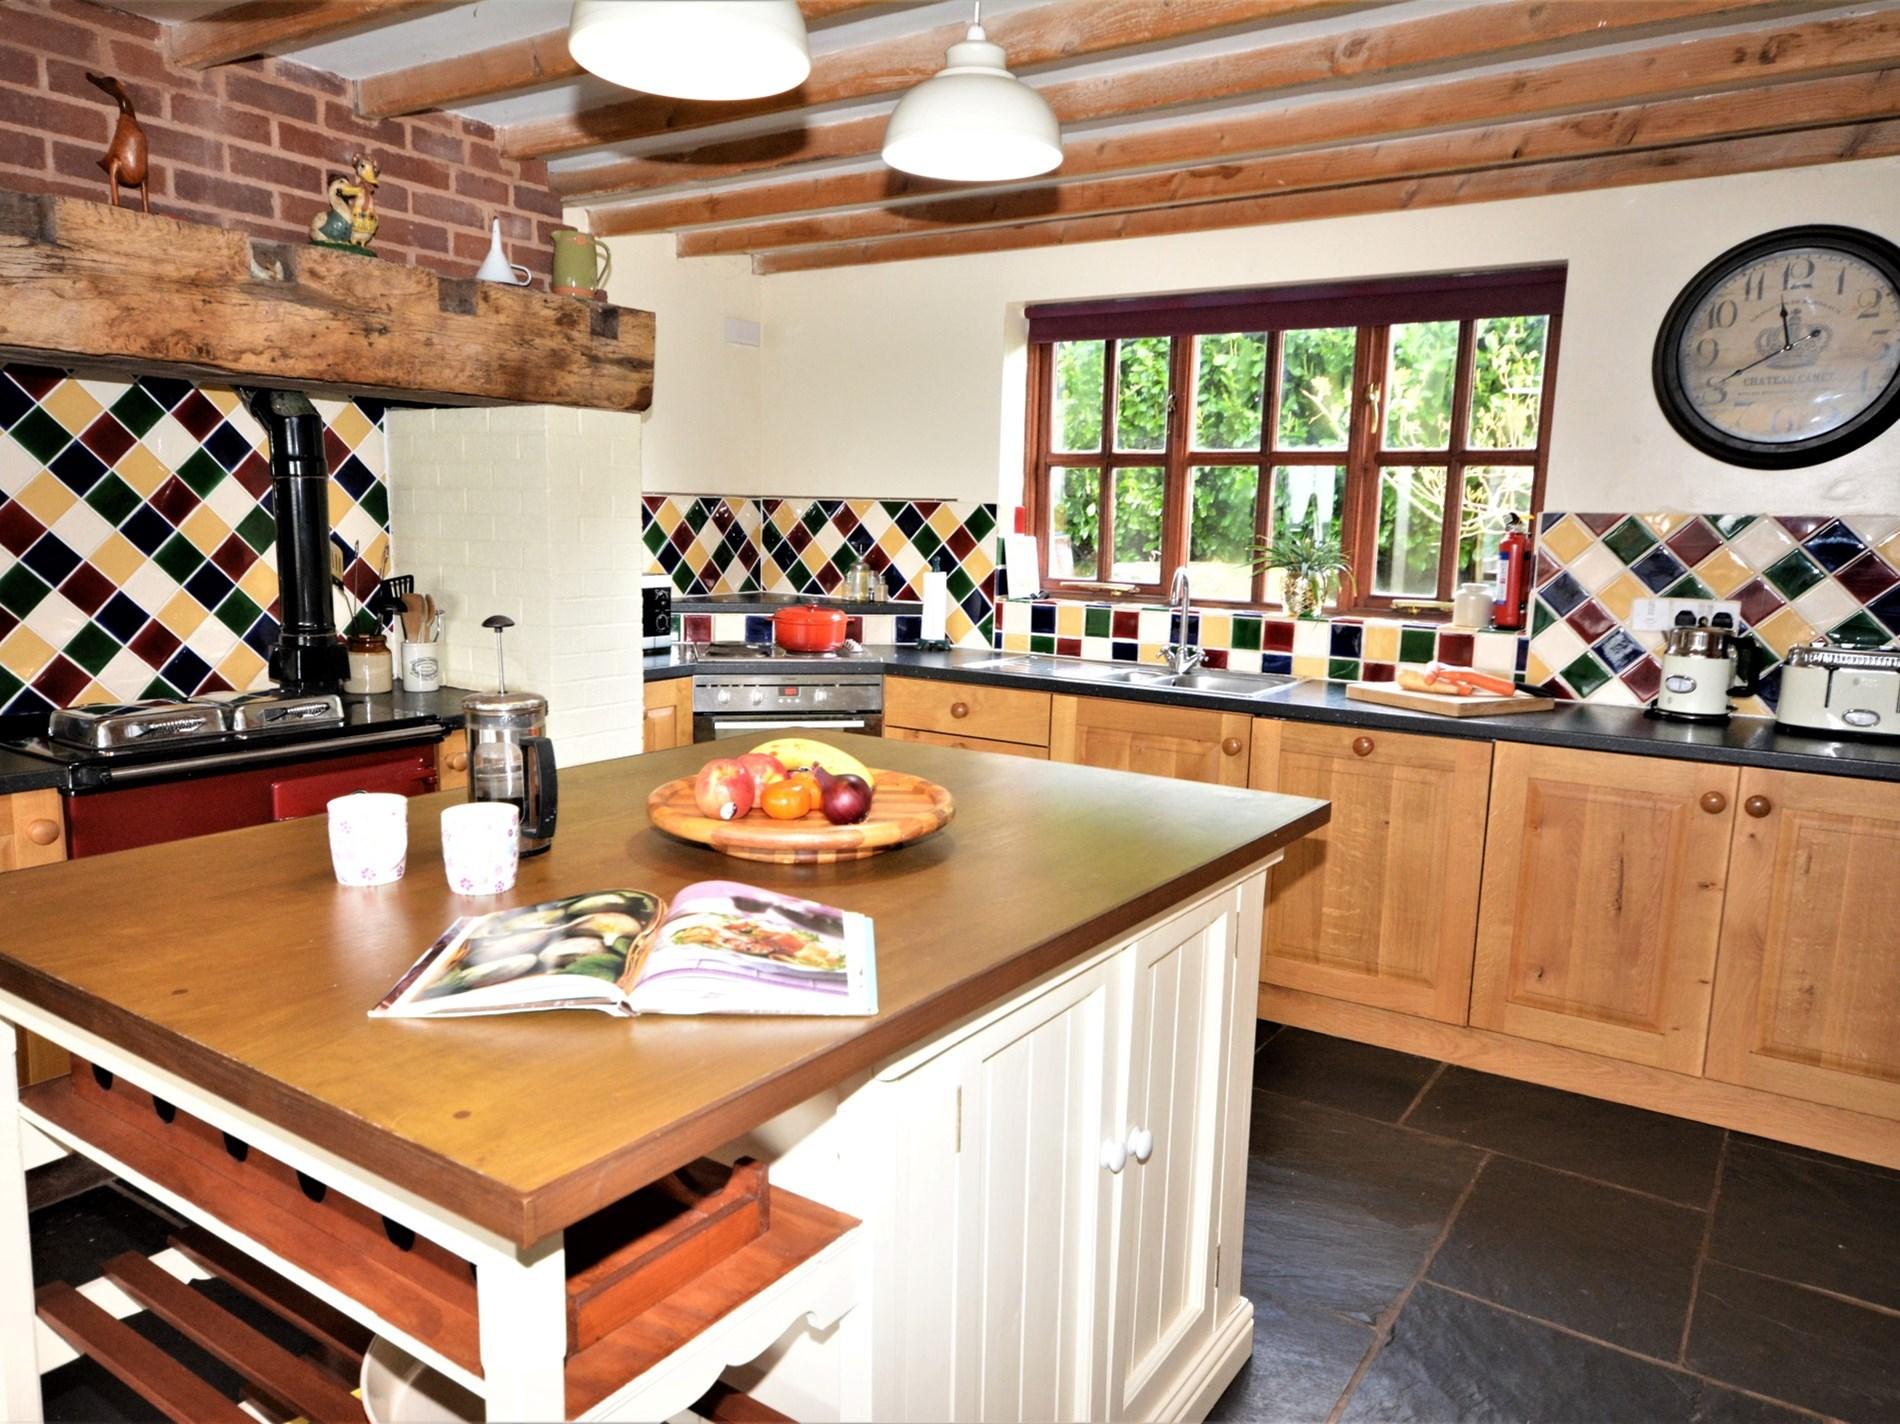 4 Bedroom Cottage in Tiverton, Devon